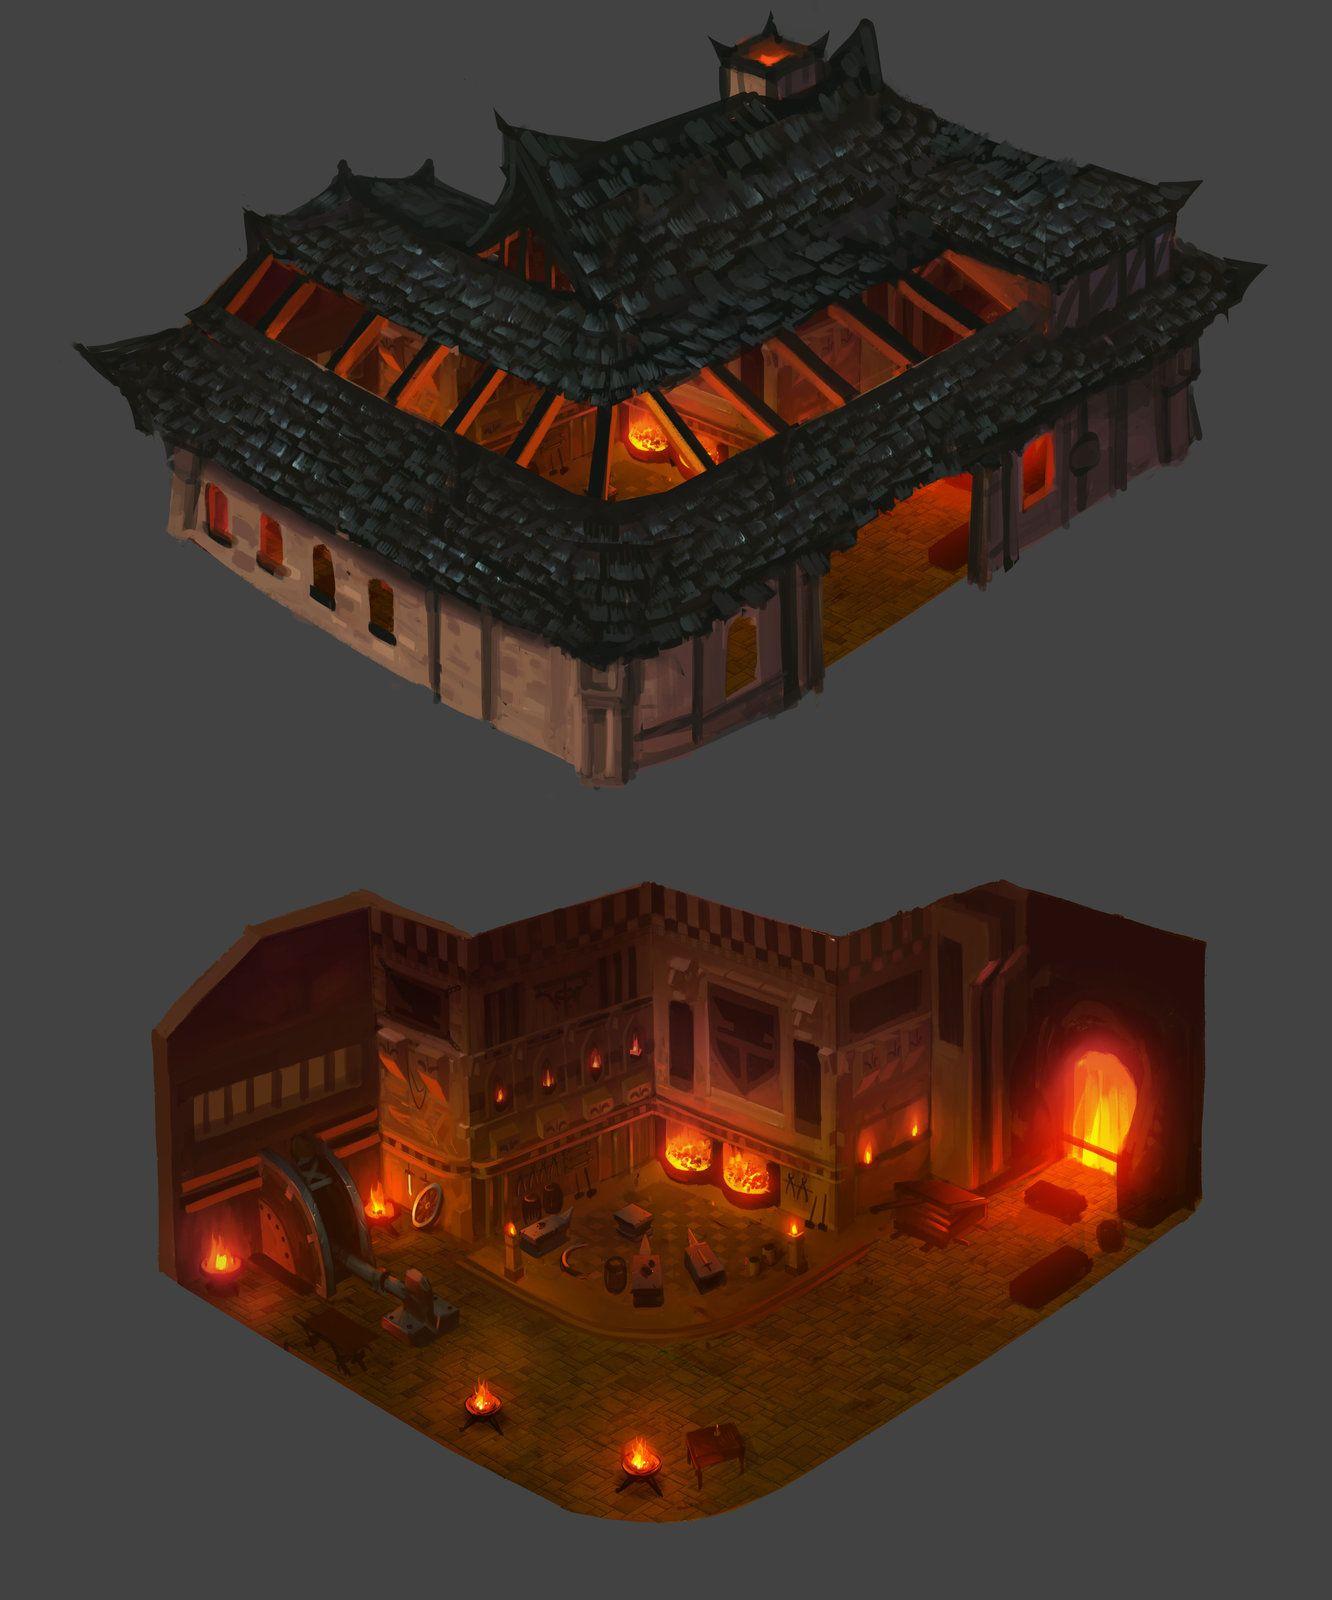 Forge design, David Ko on ArtStation at https://www.artstation.com/artwork/YG566